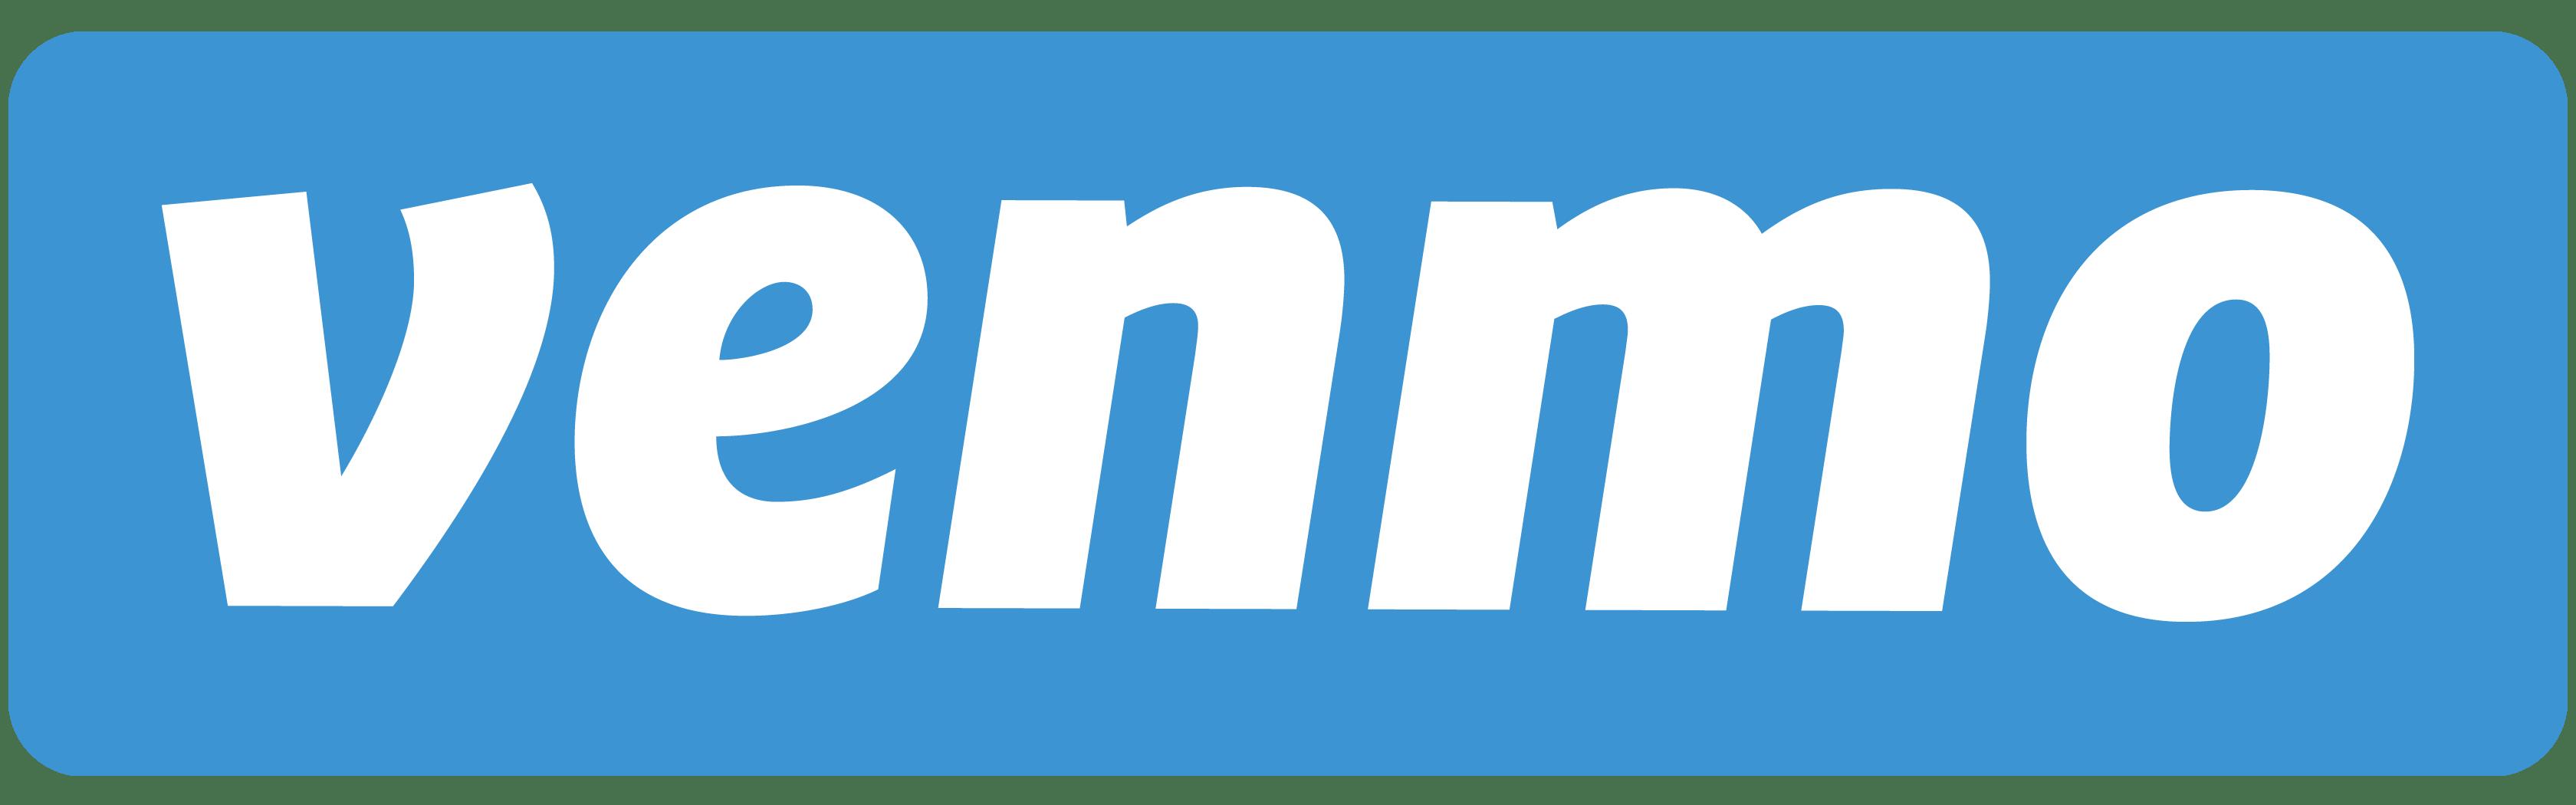 PayPal-Bezahl-App Venmo: Transaktionsdaten im Netz auffindbar